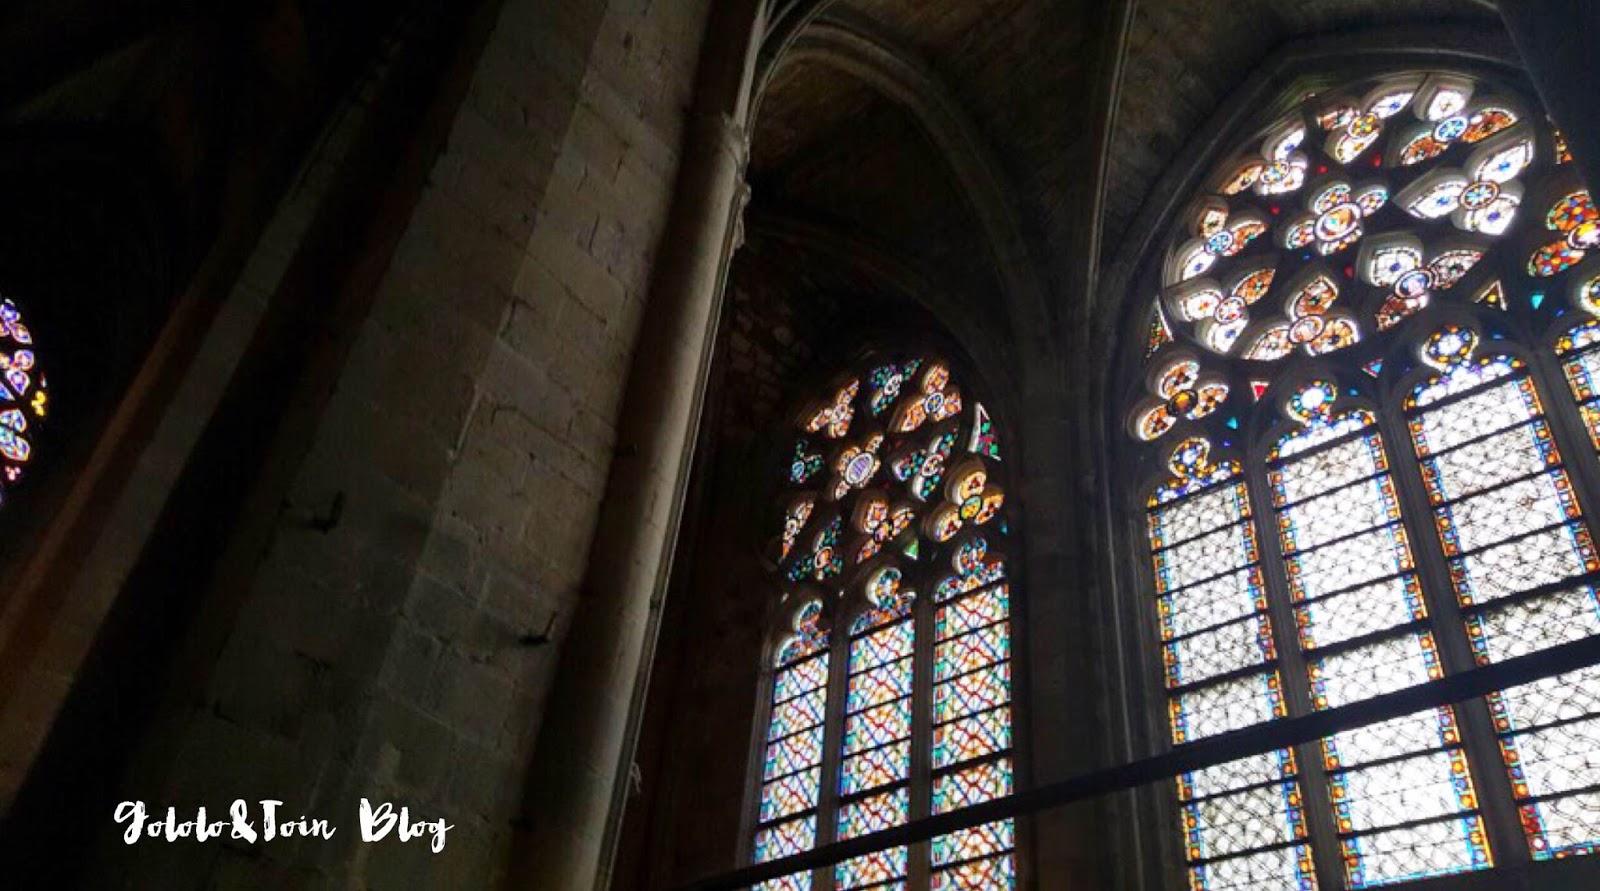 Saint-nazarie-basilica-carcasona-carcassonne-viajar-con-niños